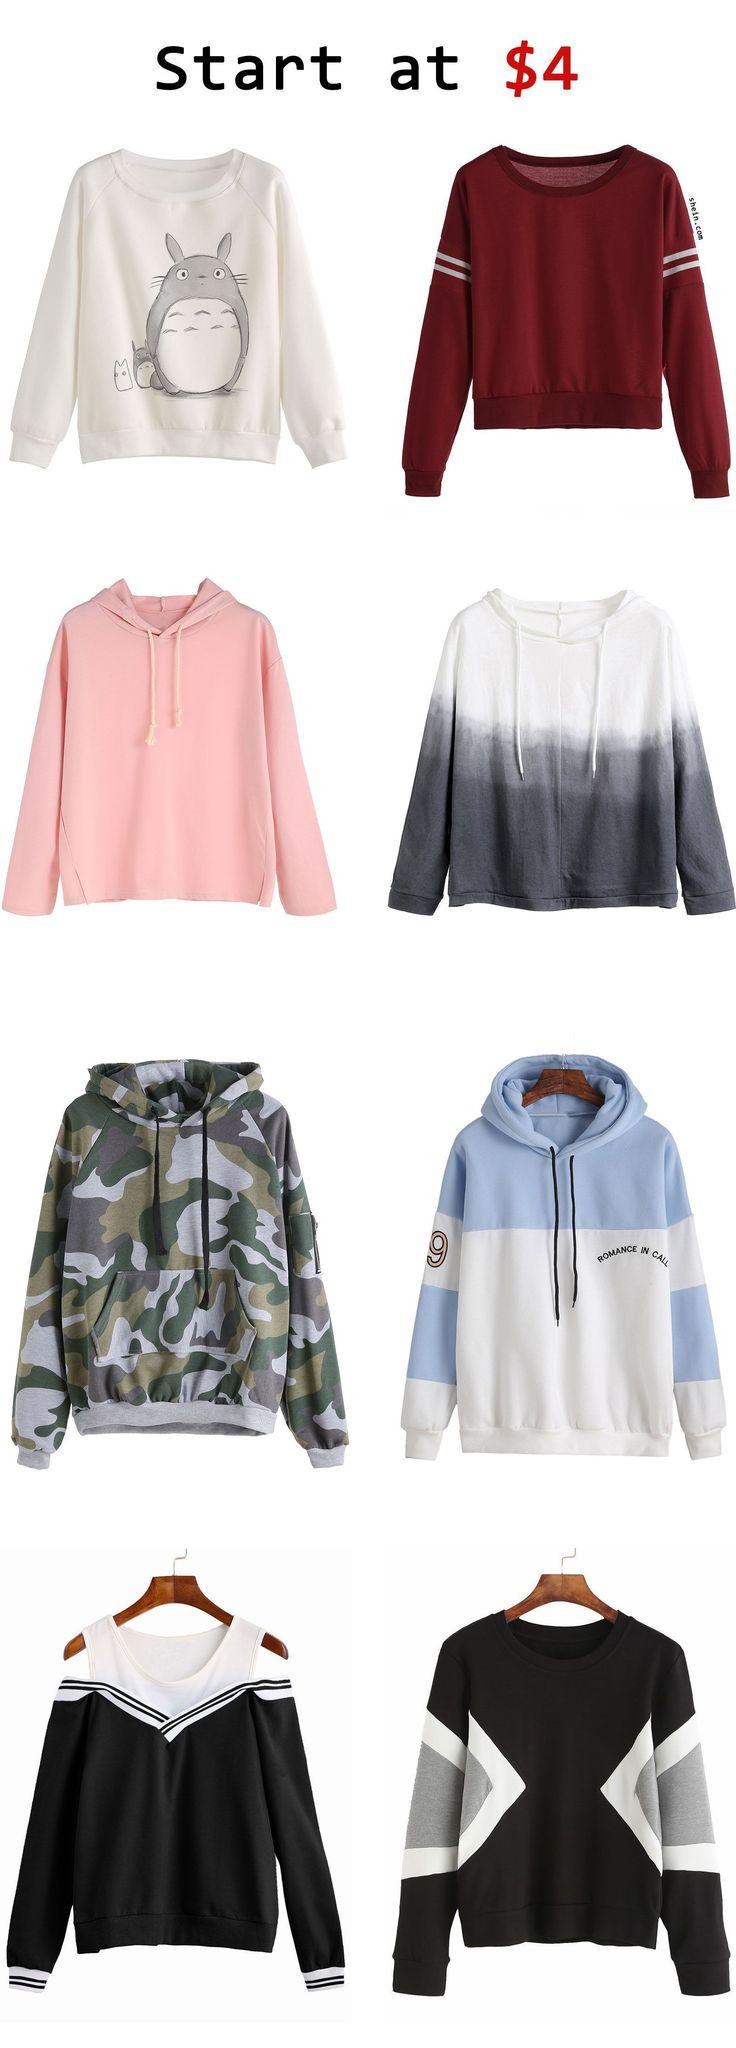 Sweatshirts start at  4 http   genf20-plus-review.com  ffb6786c933